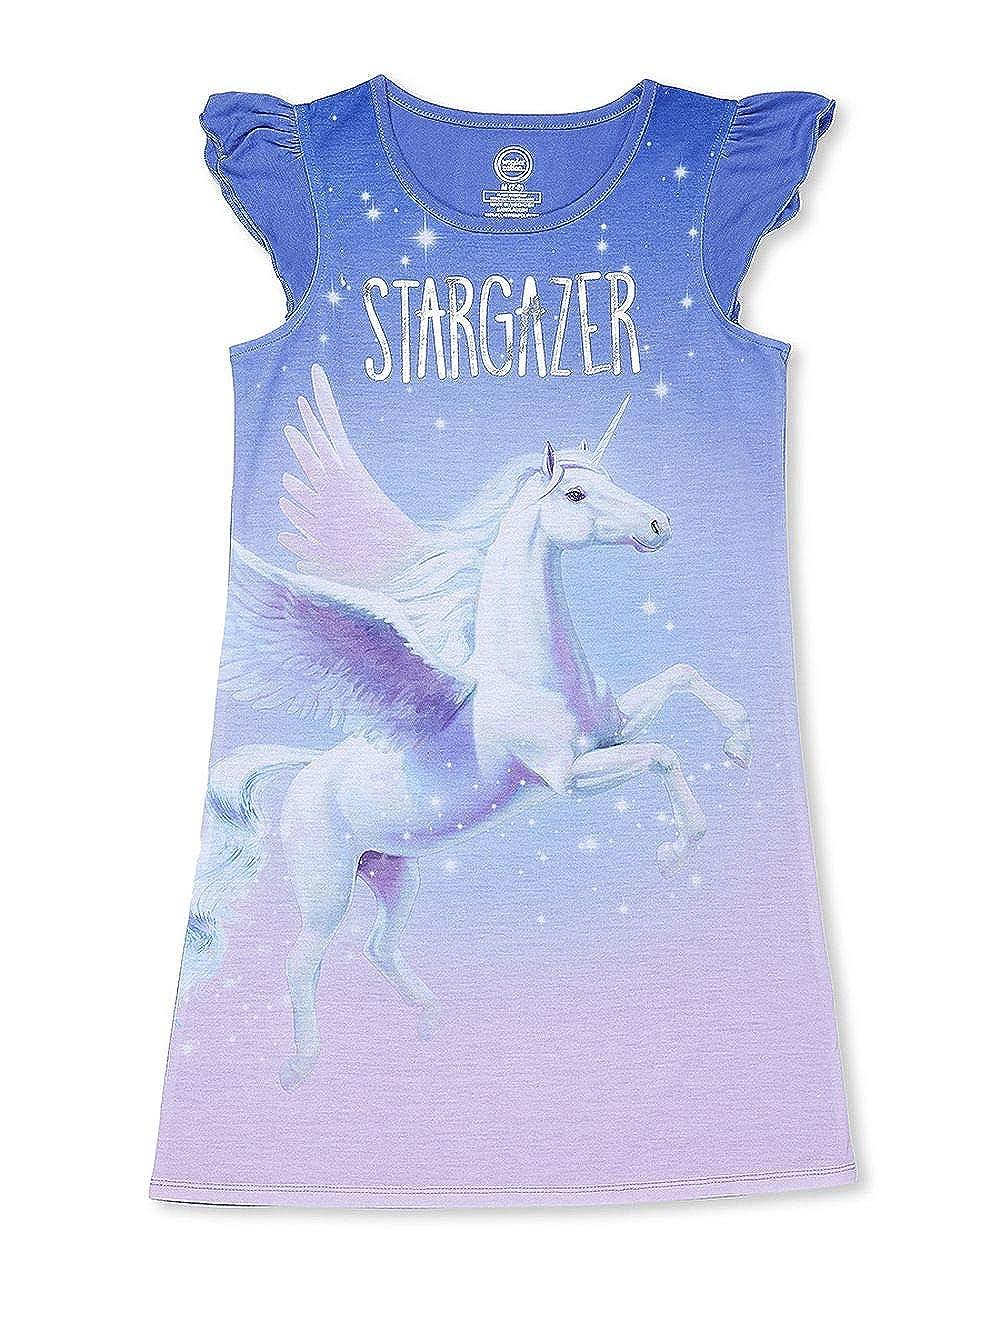 Stargazer Unicorn with Wings Purple Unicorn Nightgown for Girls